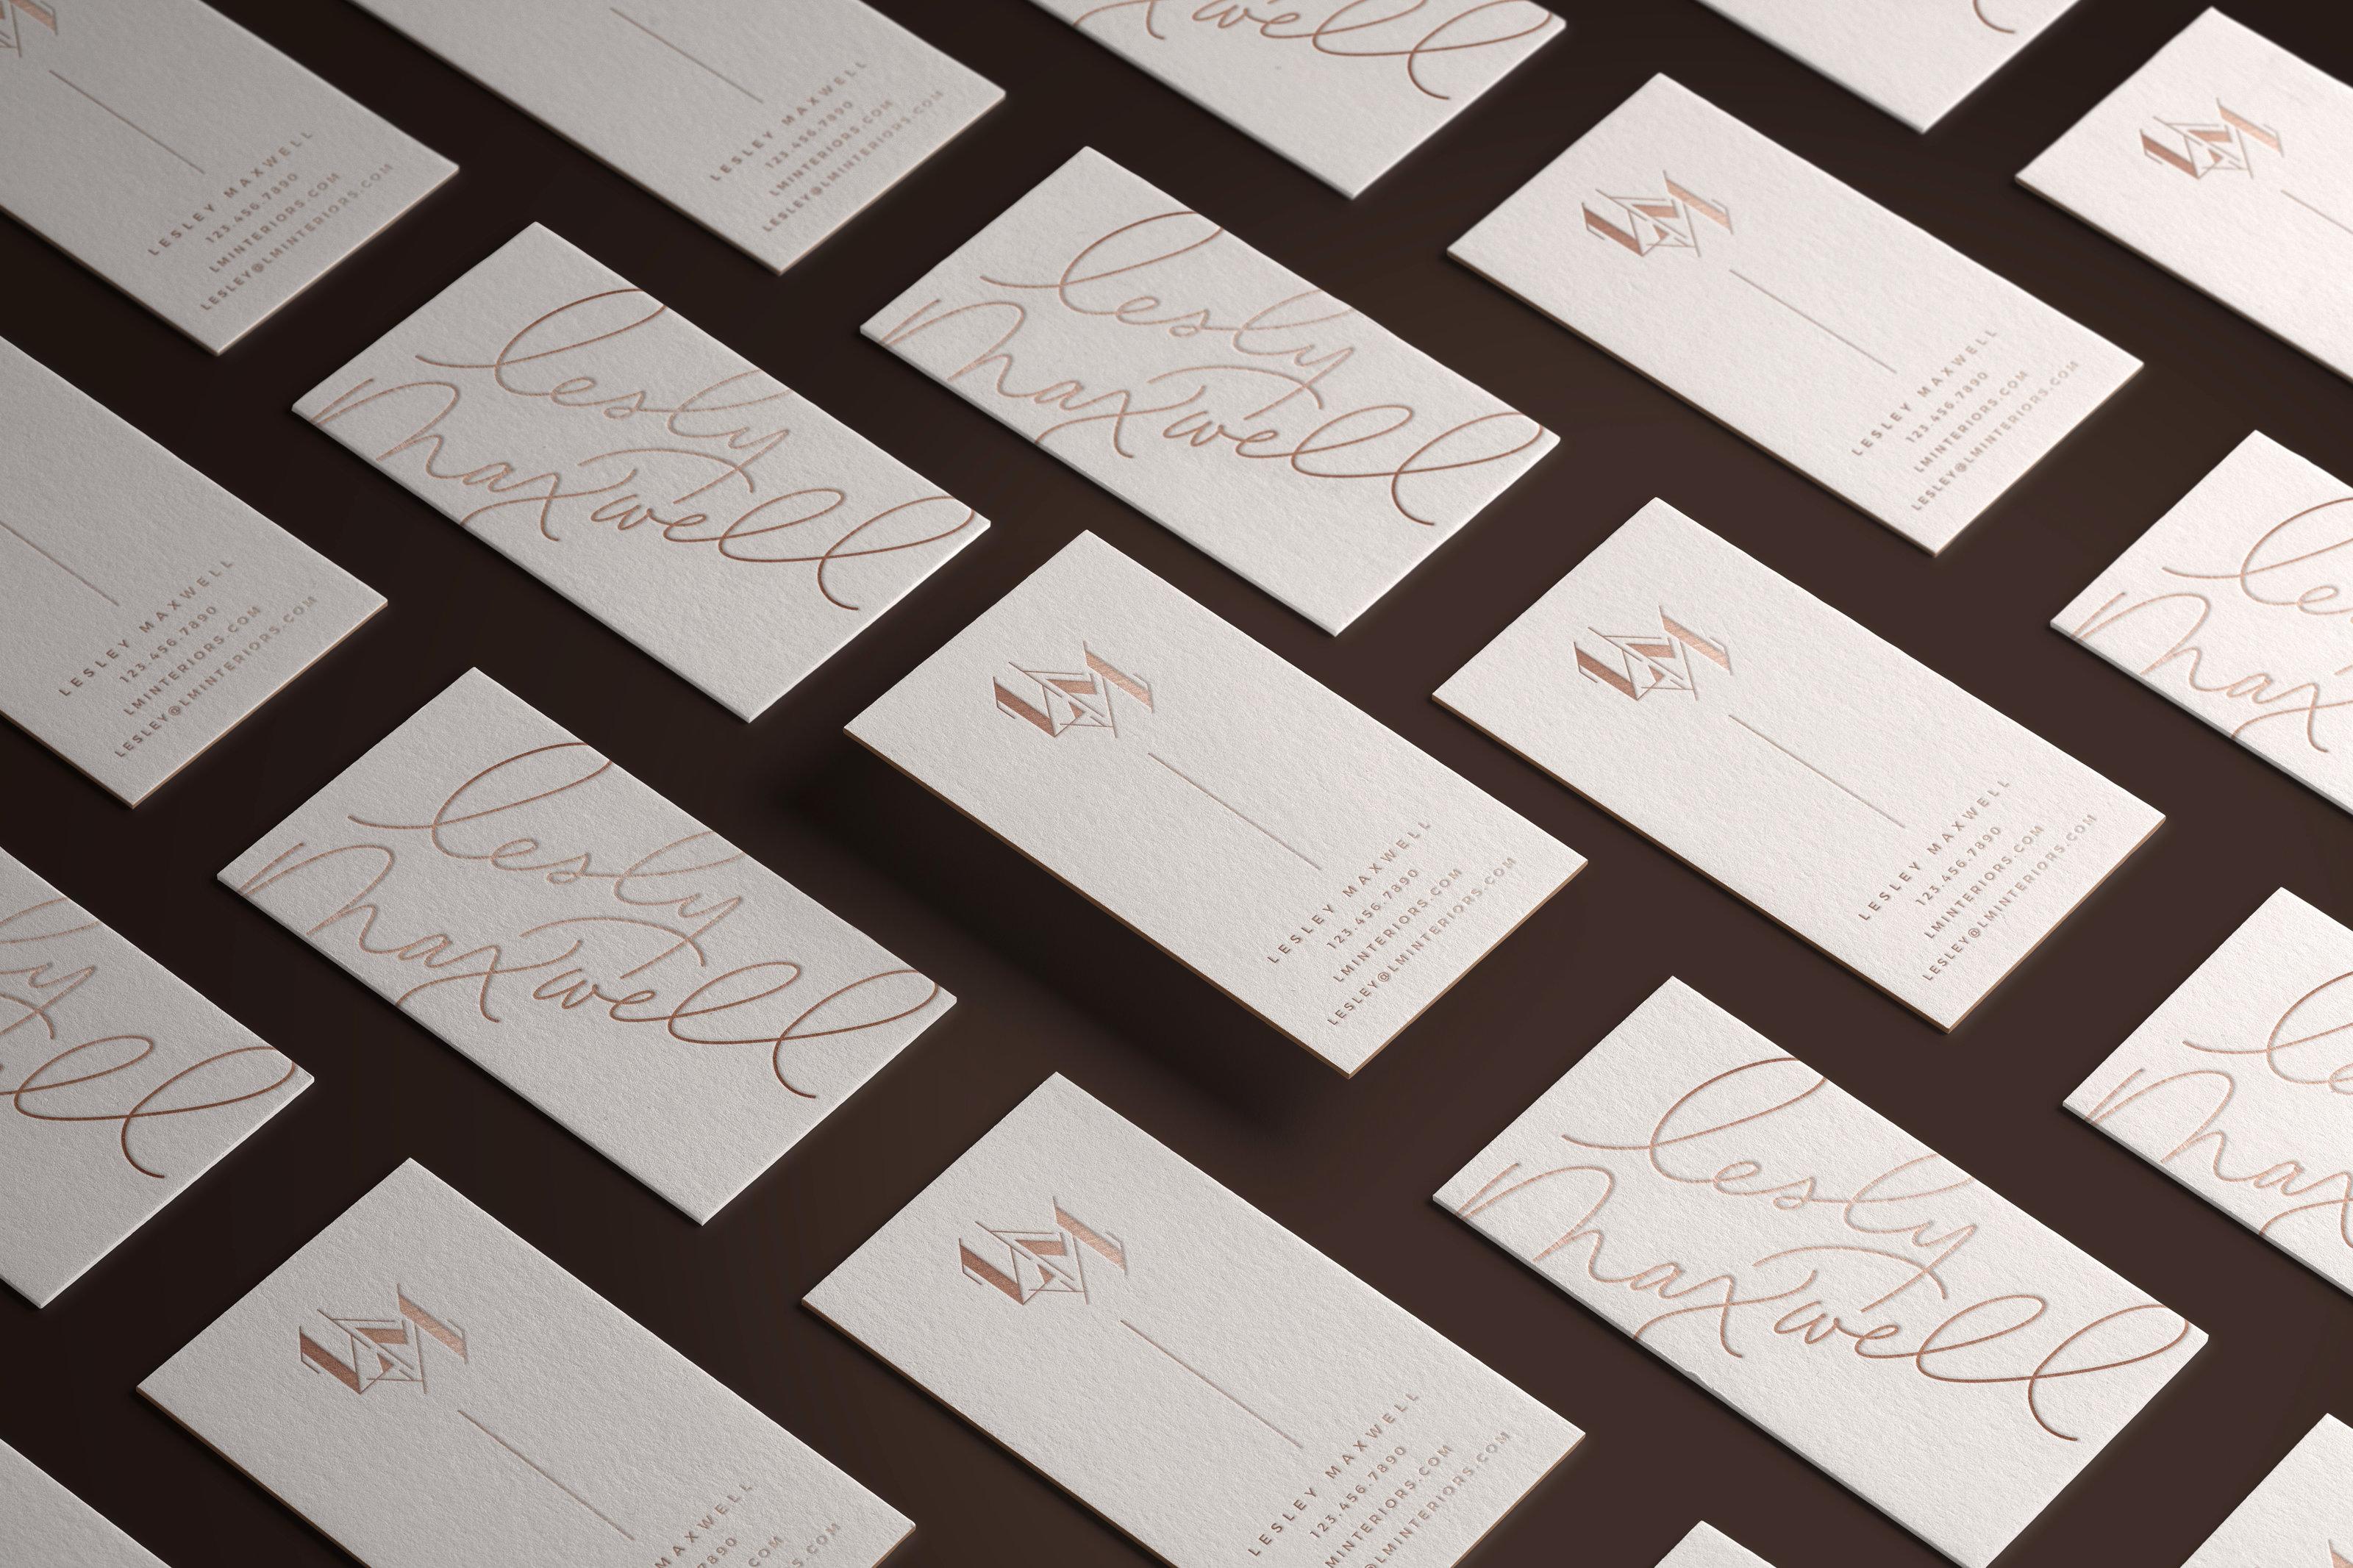 Modern Brand and Website Design - Modern Lettered Logo - Saffron Avenue - Brand Board, Inspiration Board, Modern Logo Design, Geometric, Website Design, Website Layout